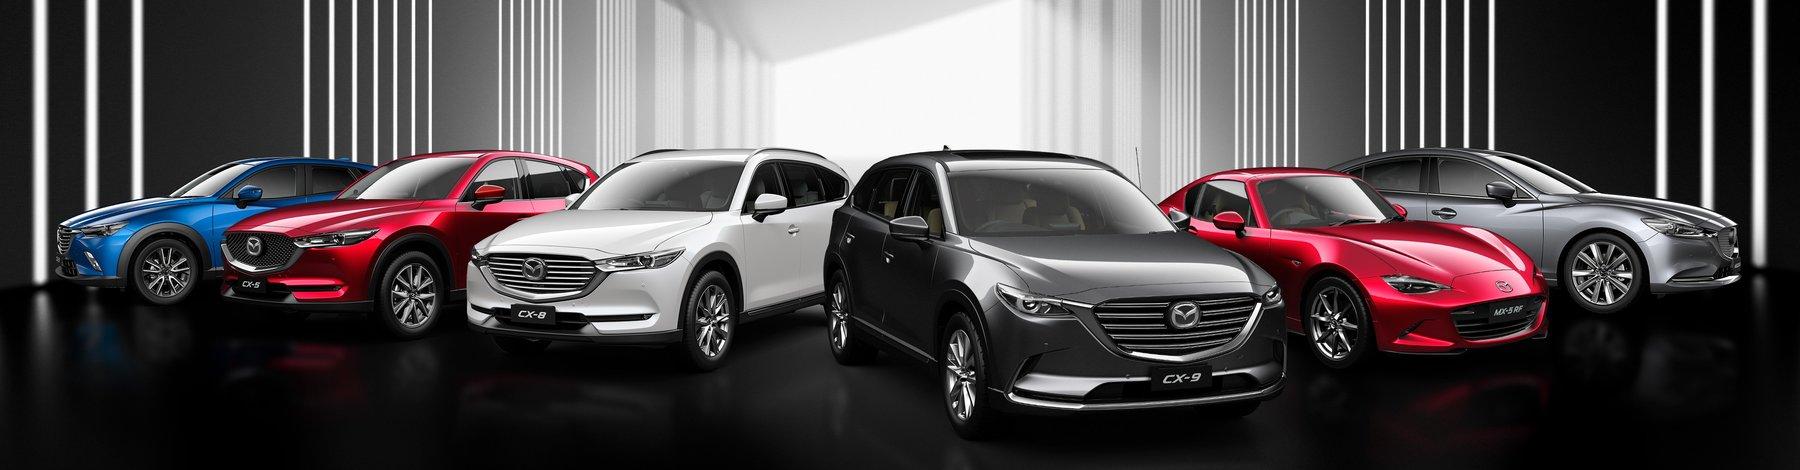 Corporate select and fleet sales at Rockingham Mazda